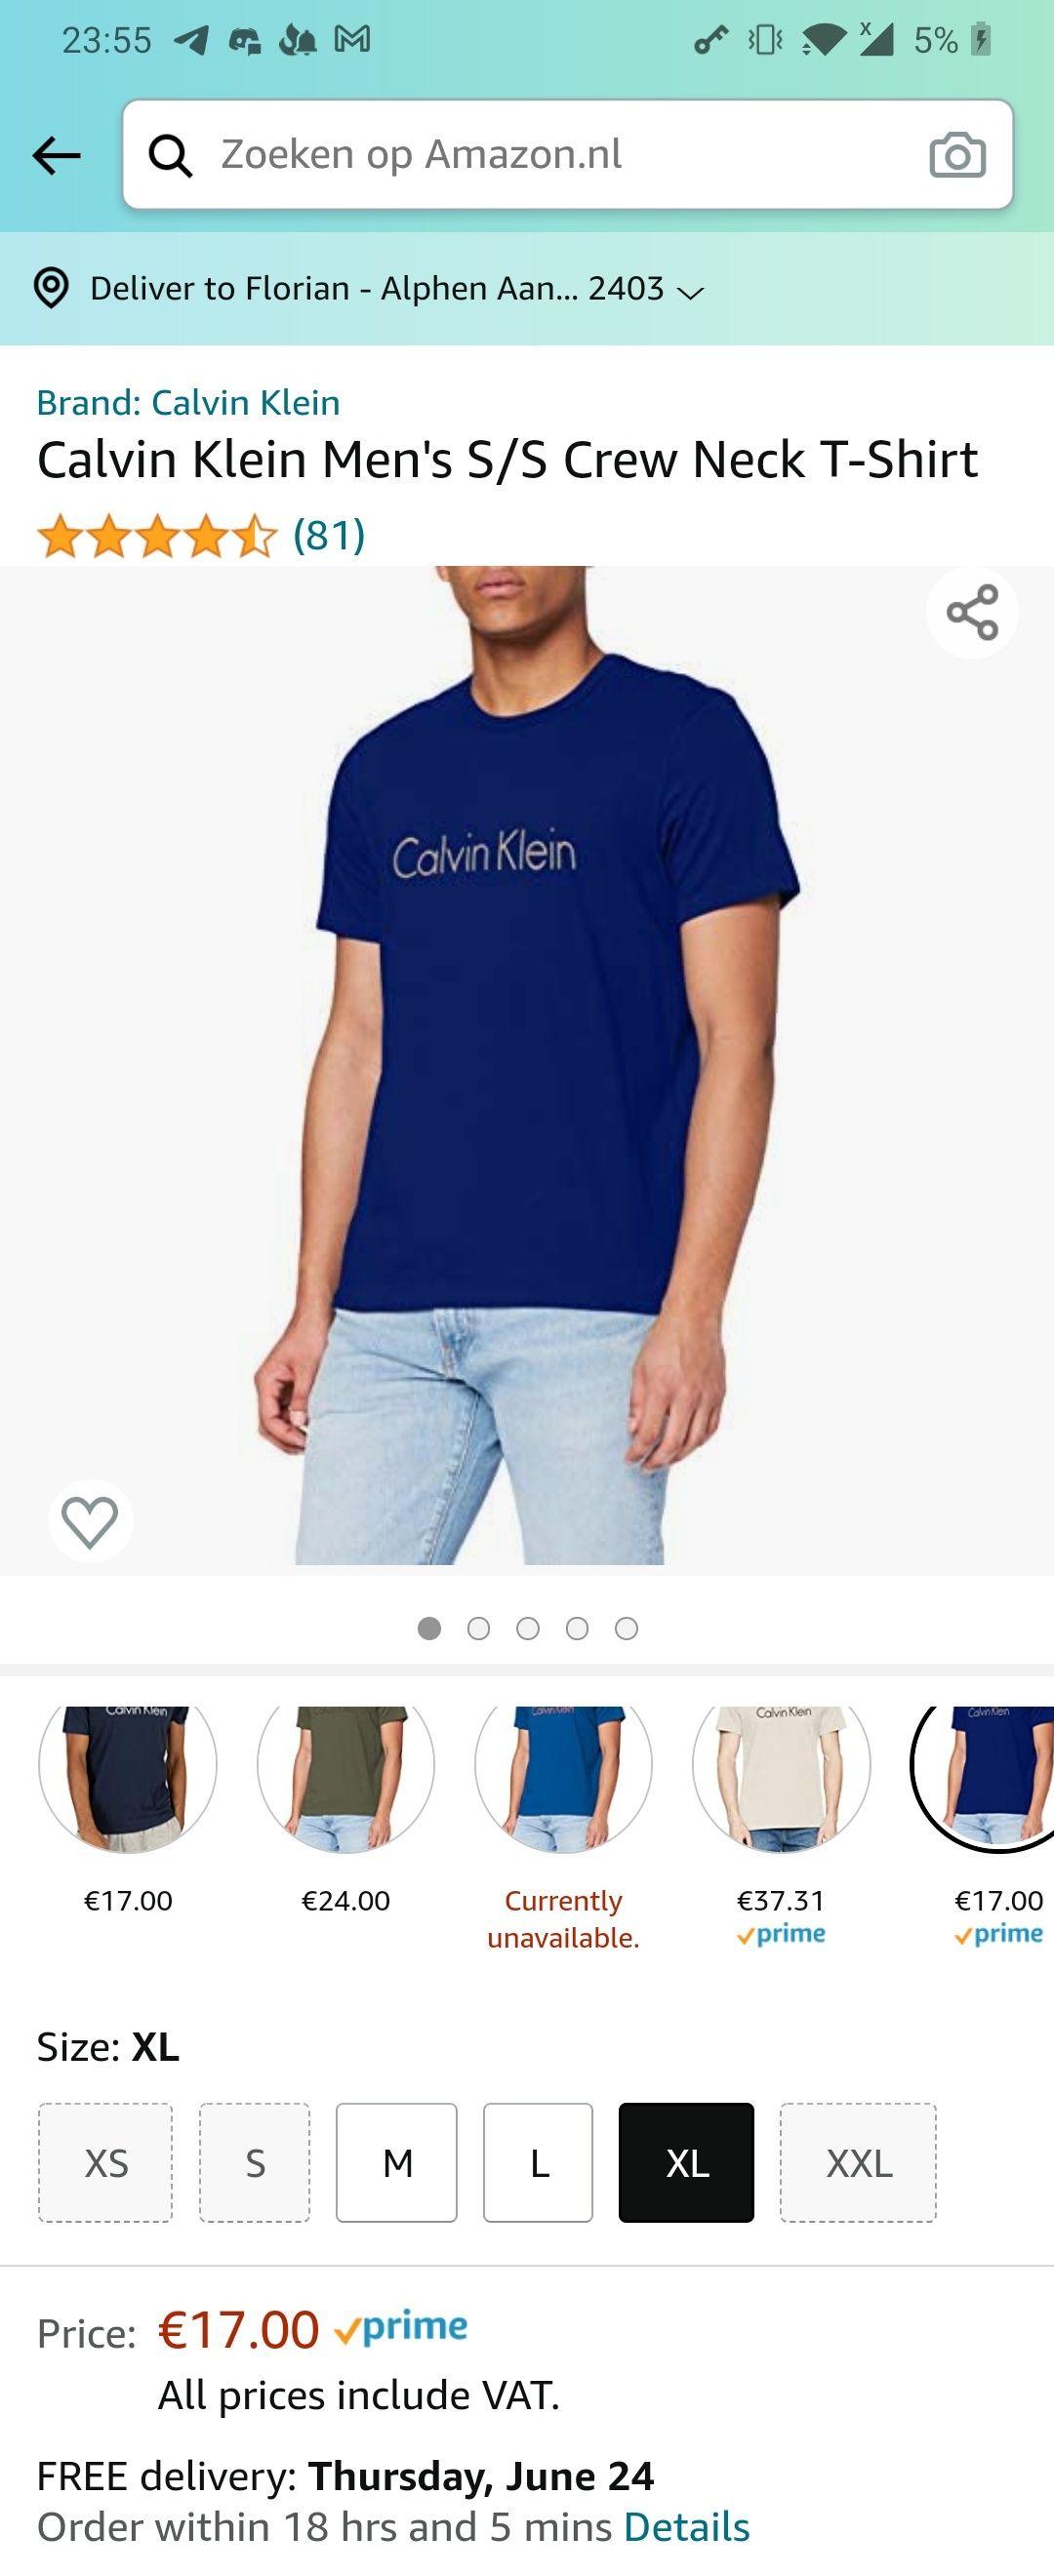 [Prime] Calvin klein t-shirts